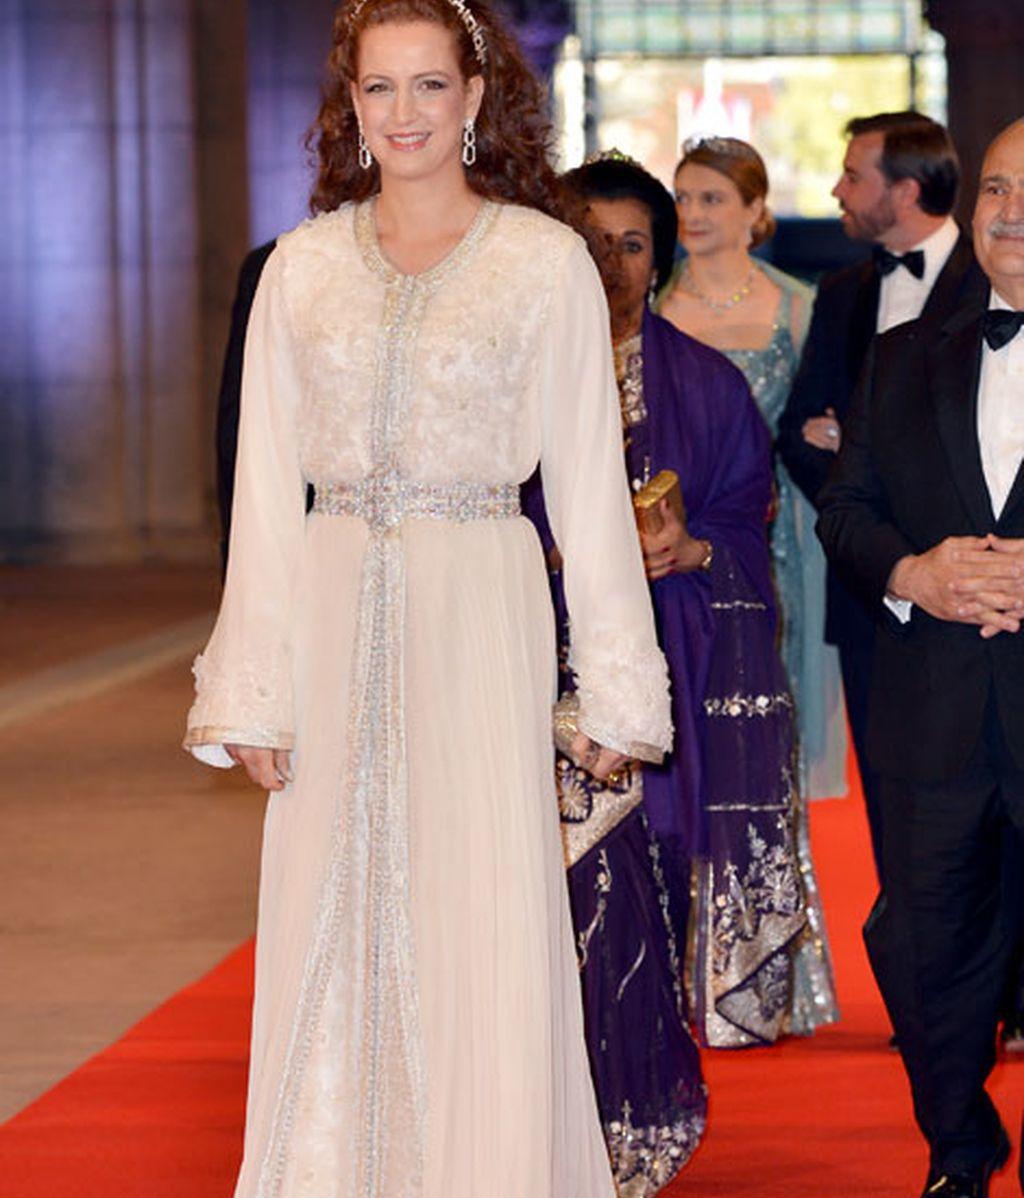 La princesa Lalla Salma de Marruecos